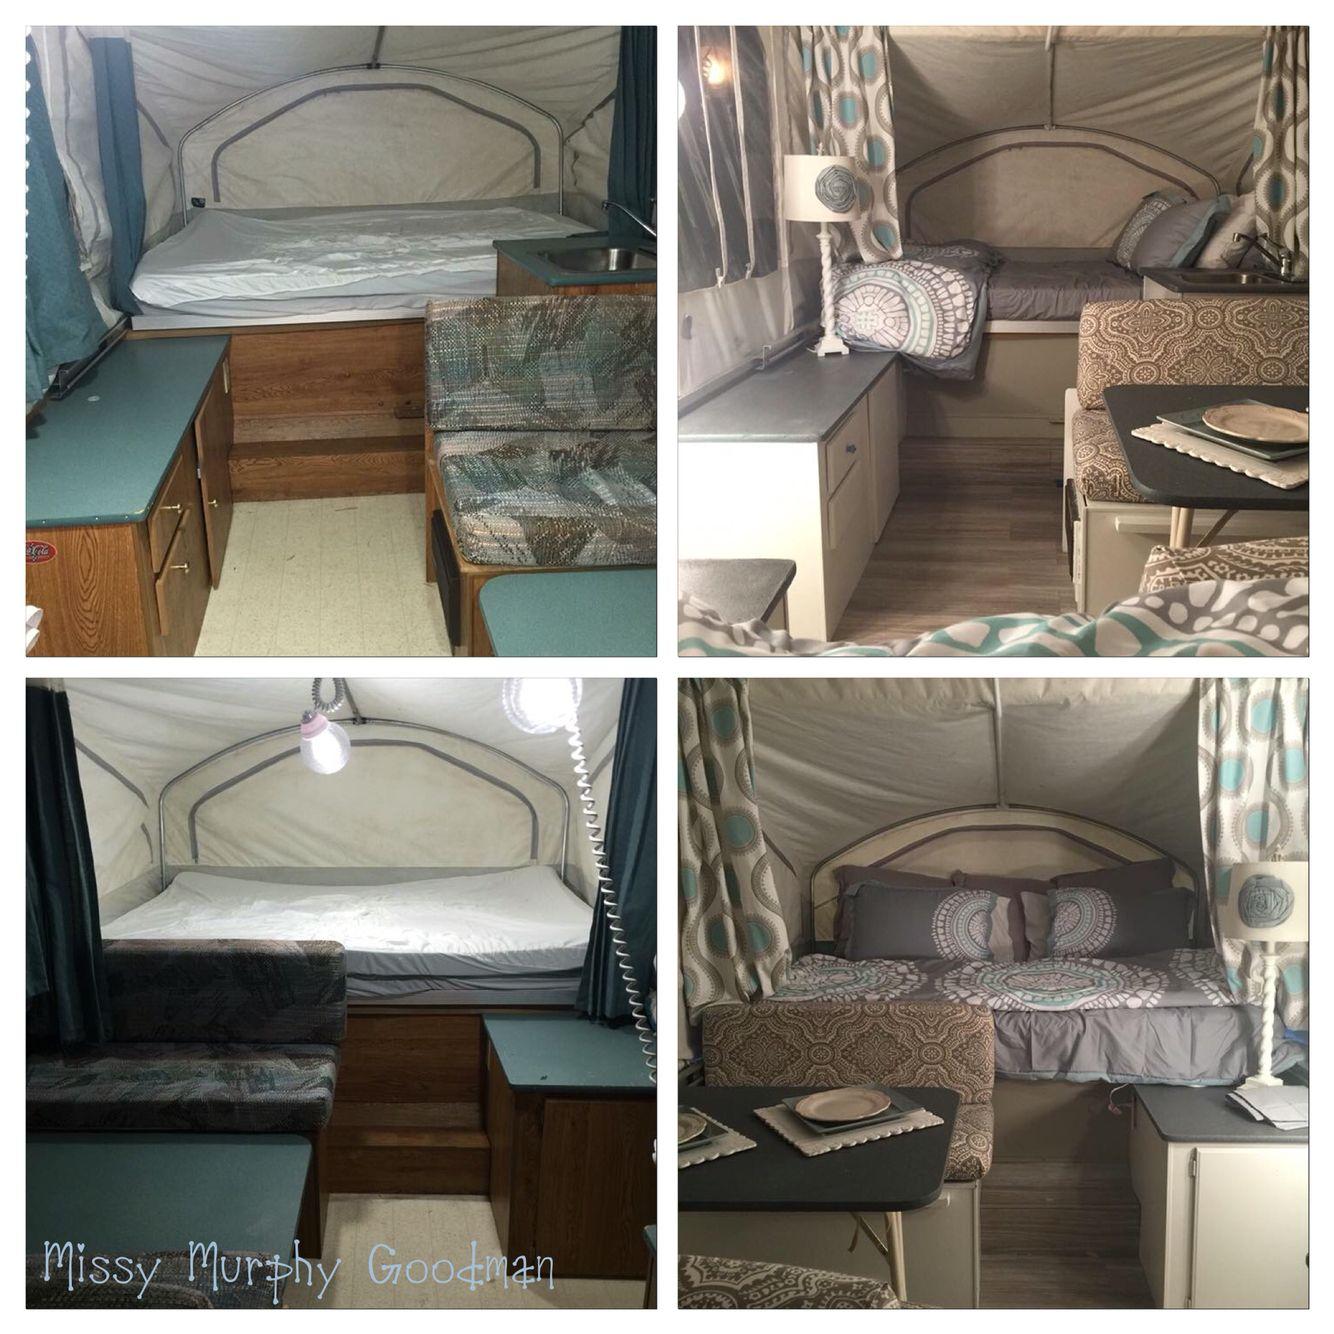 Before and After pop up camper. | Glampers/Pop Ups & More! | Pinterest